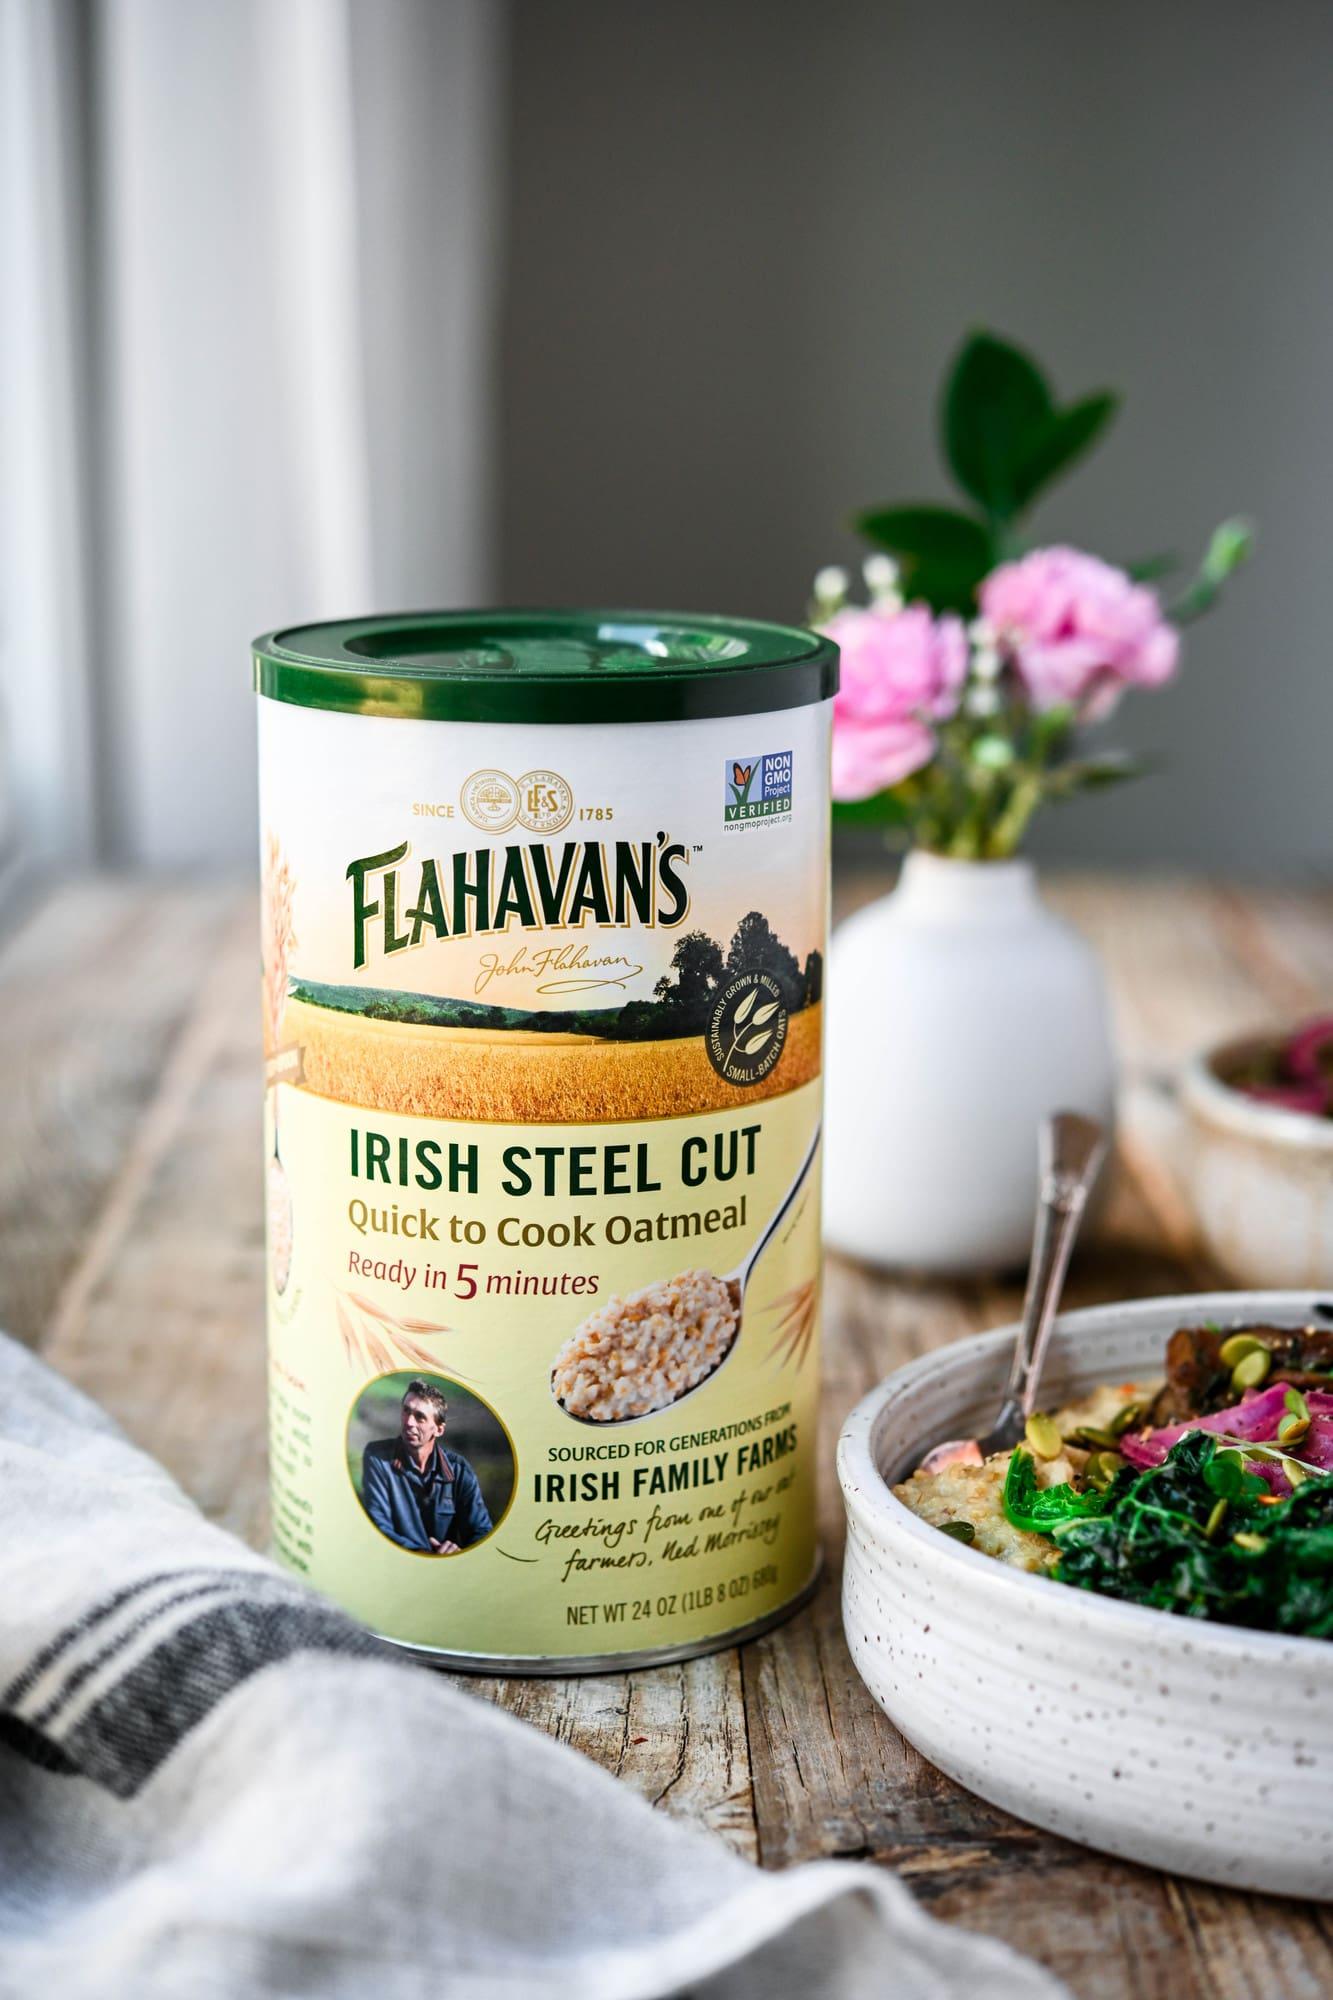 Side view of container of Flahavan's Irish Steel Cut Oatmeal on wood table